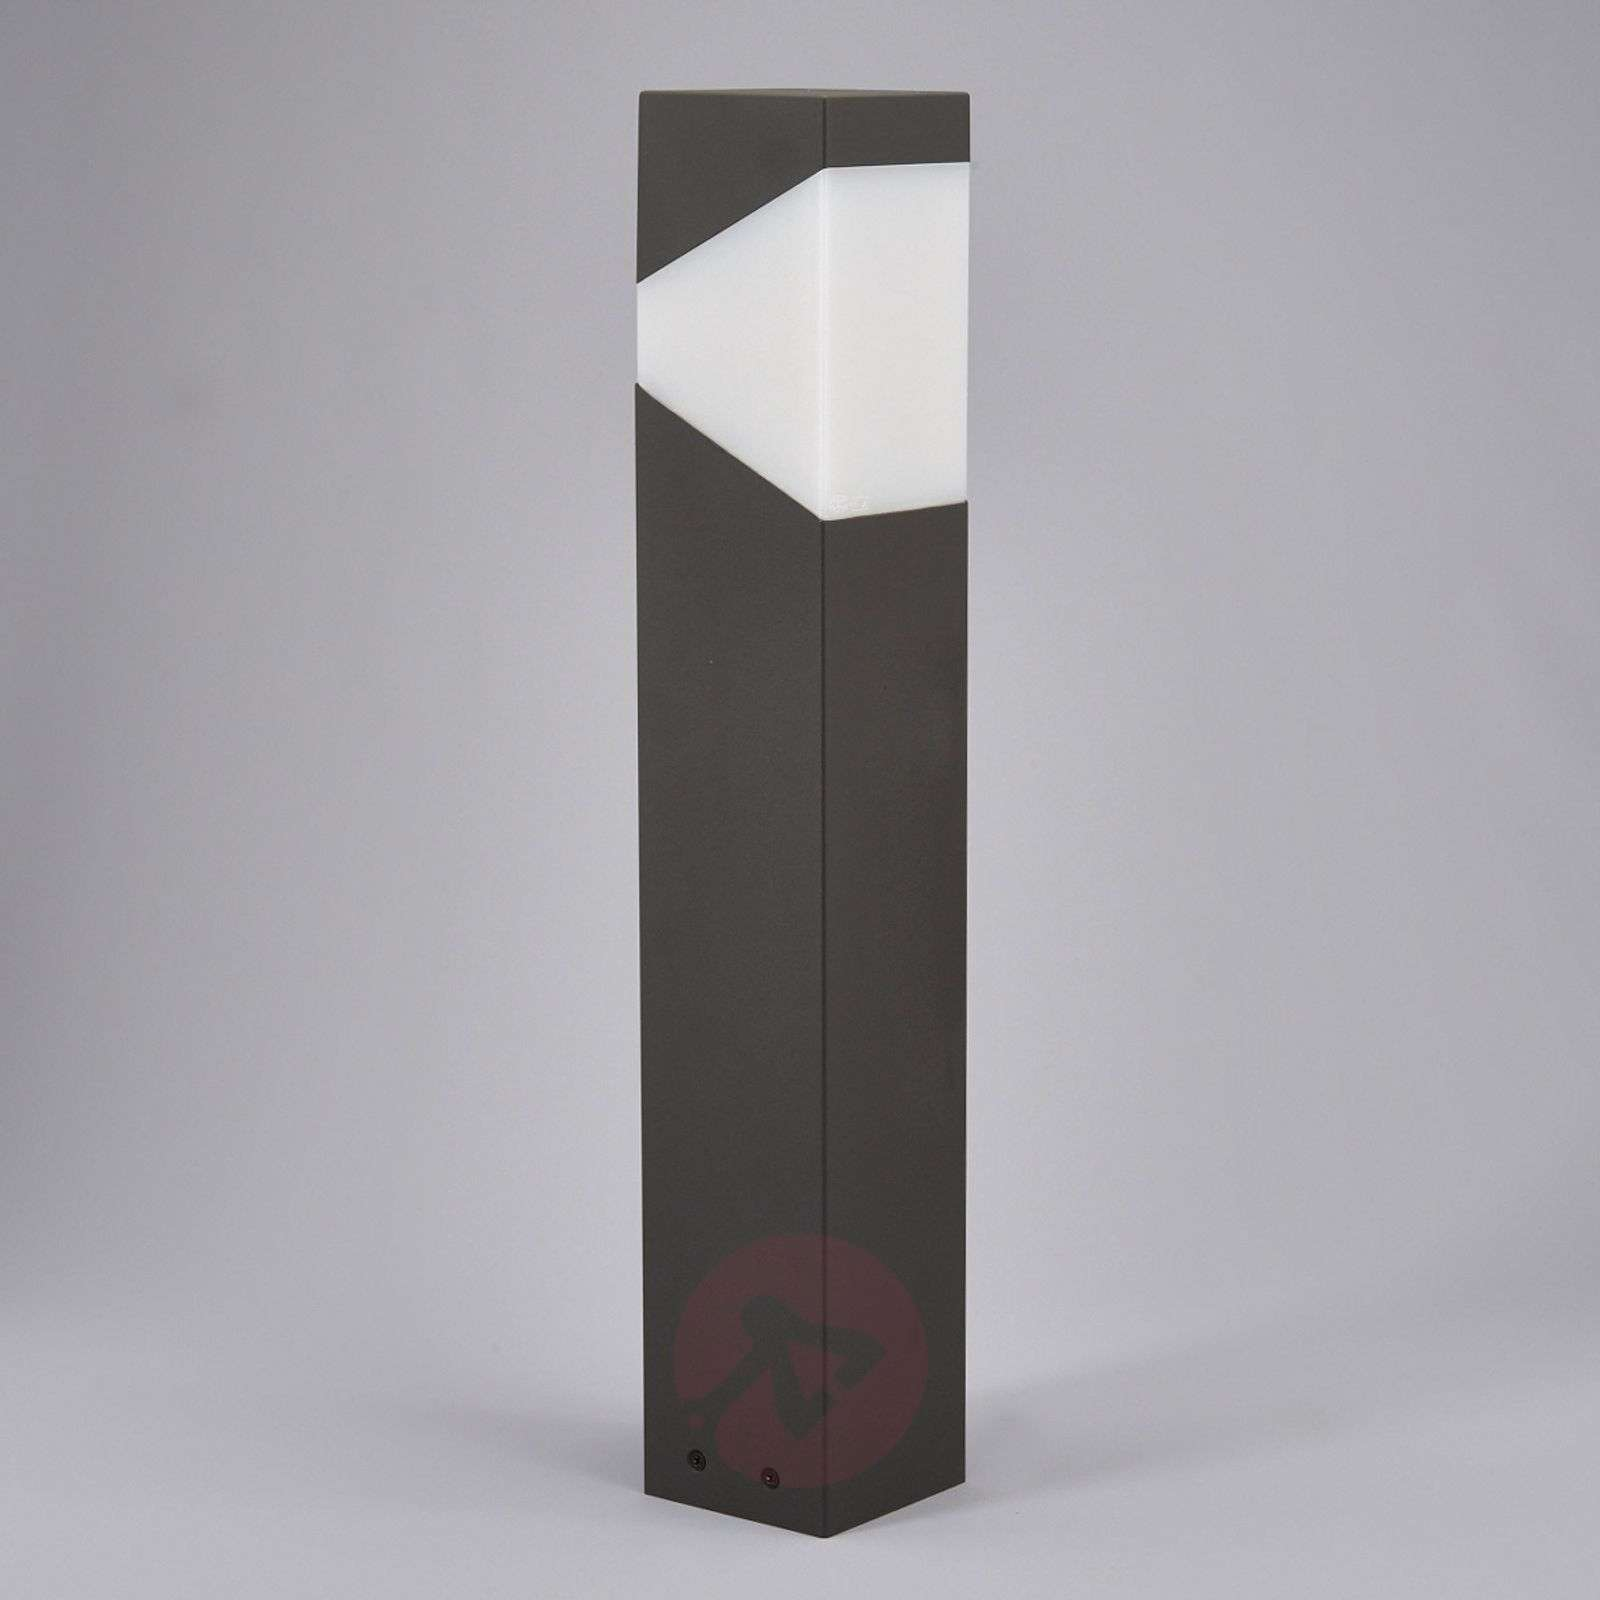 com beautiful p version auto pedestal webp x formica width inspirational sculpture of for format